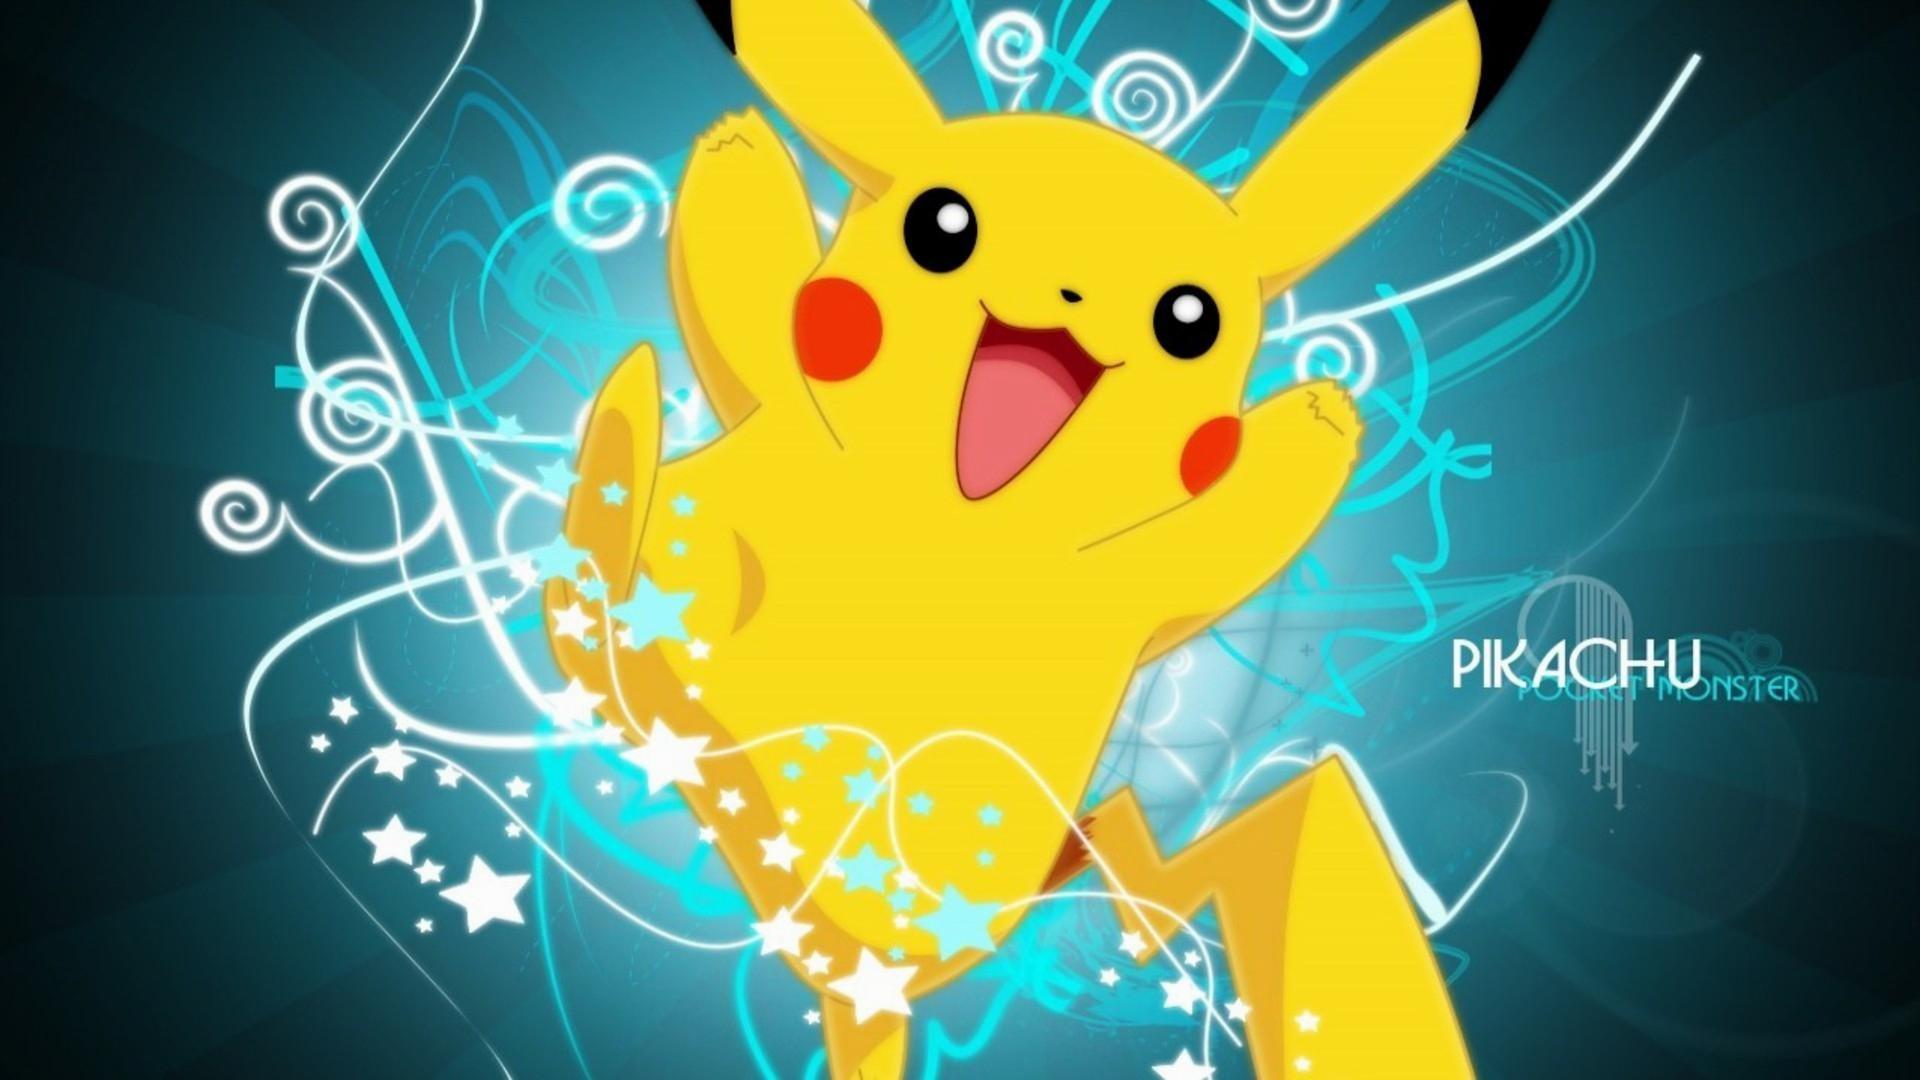 1080x1920 Wallpaper Pokemon Go Pokeball Ball Game